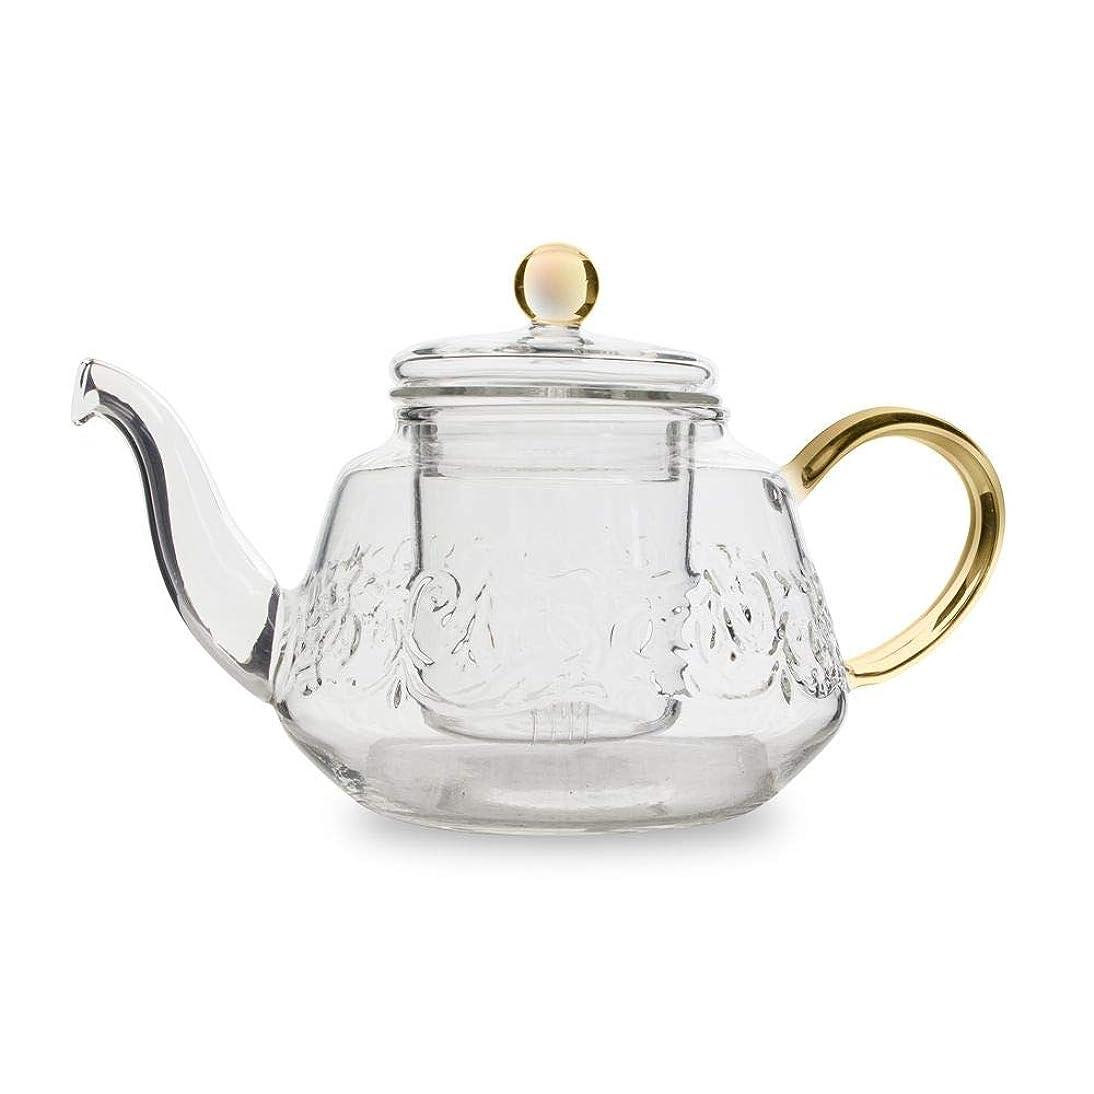 Winston Swirl Teapot wtih Amber Handle (20oz) diqj857658455147